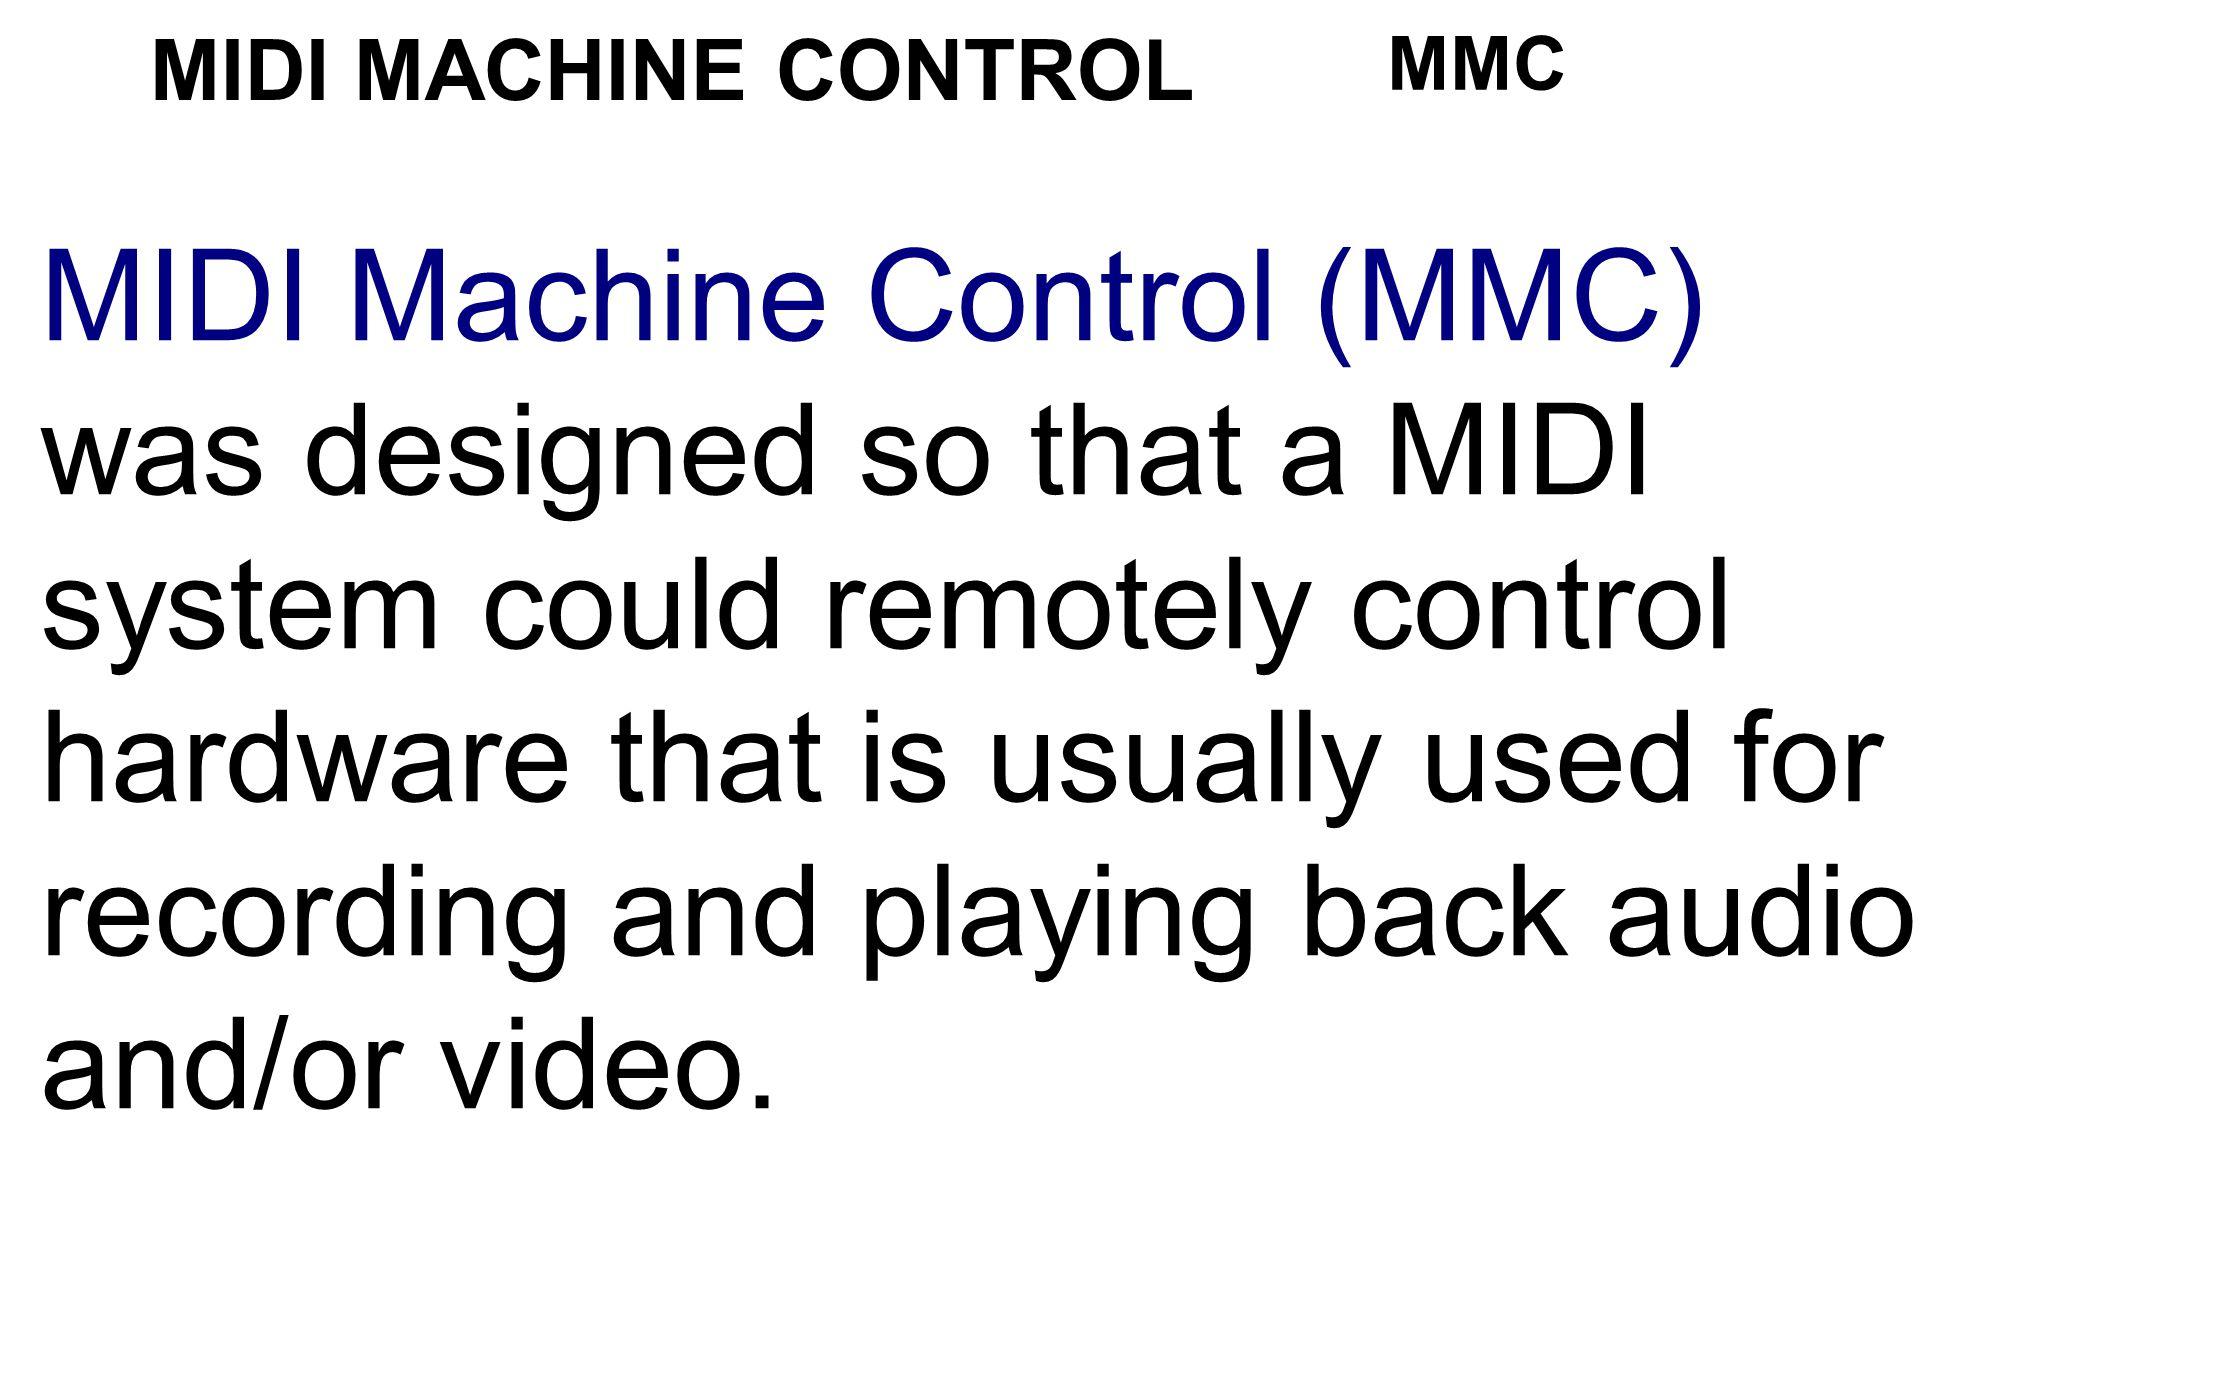 MIDI MACHINE CONTROL MMC